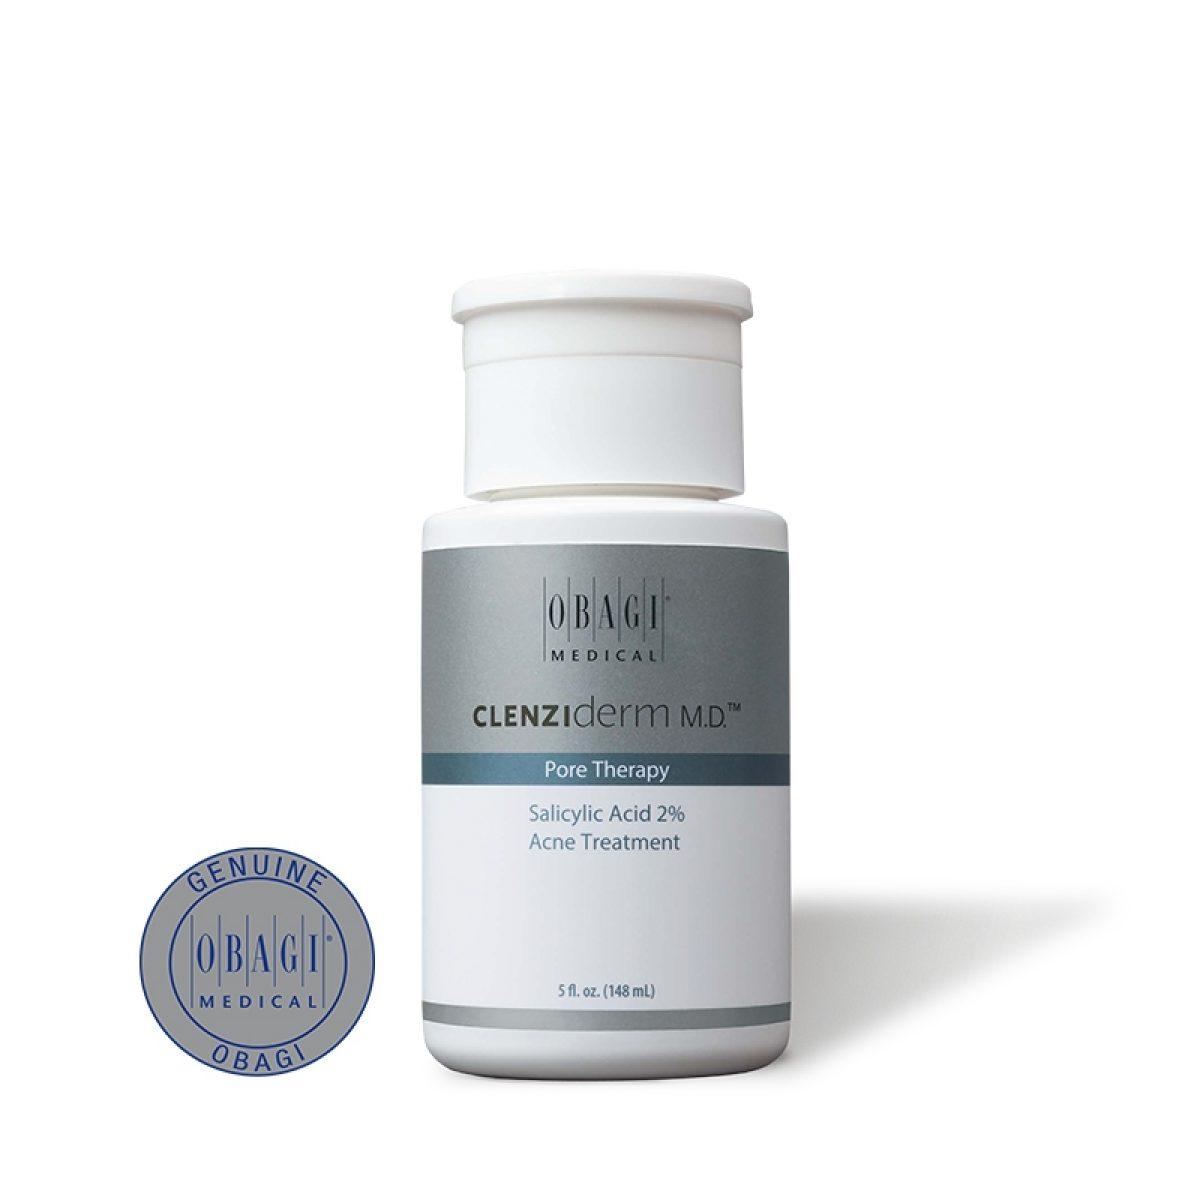 Obagi CLENZIderm M.D Pore Therapy